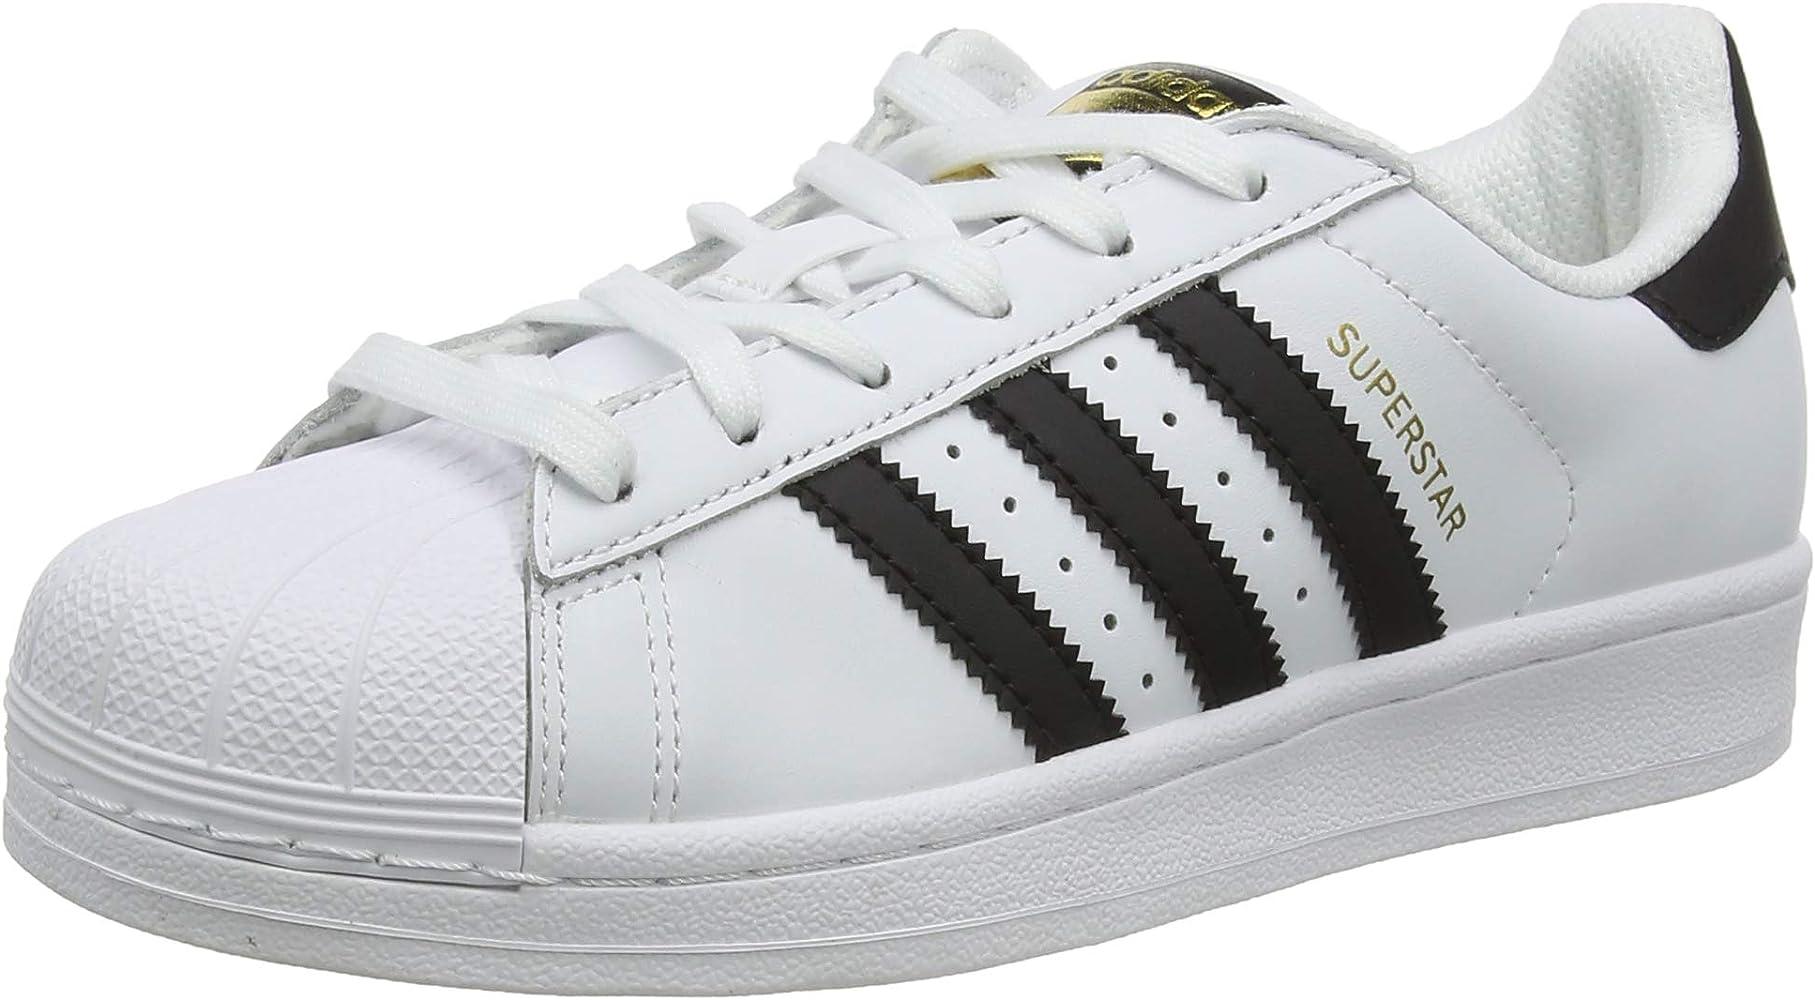 adidas Originals Men's Superstar White